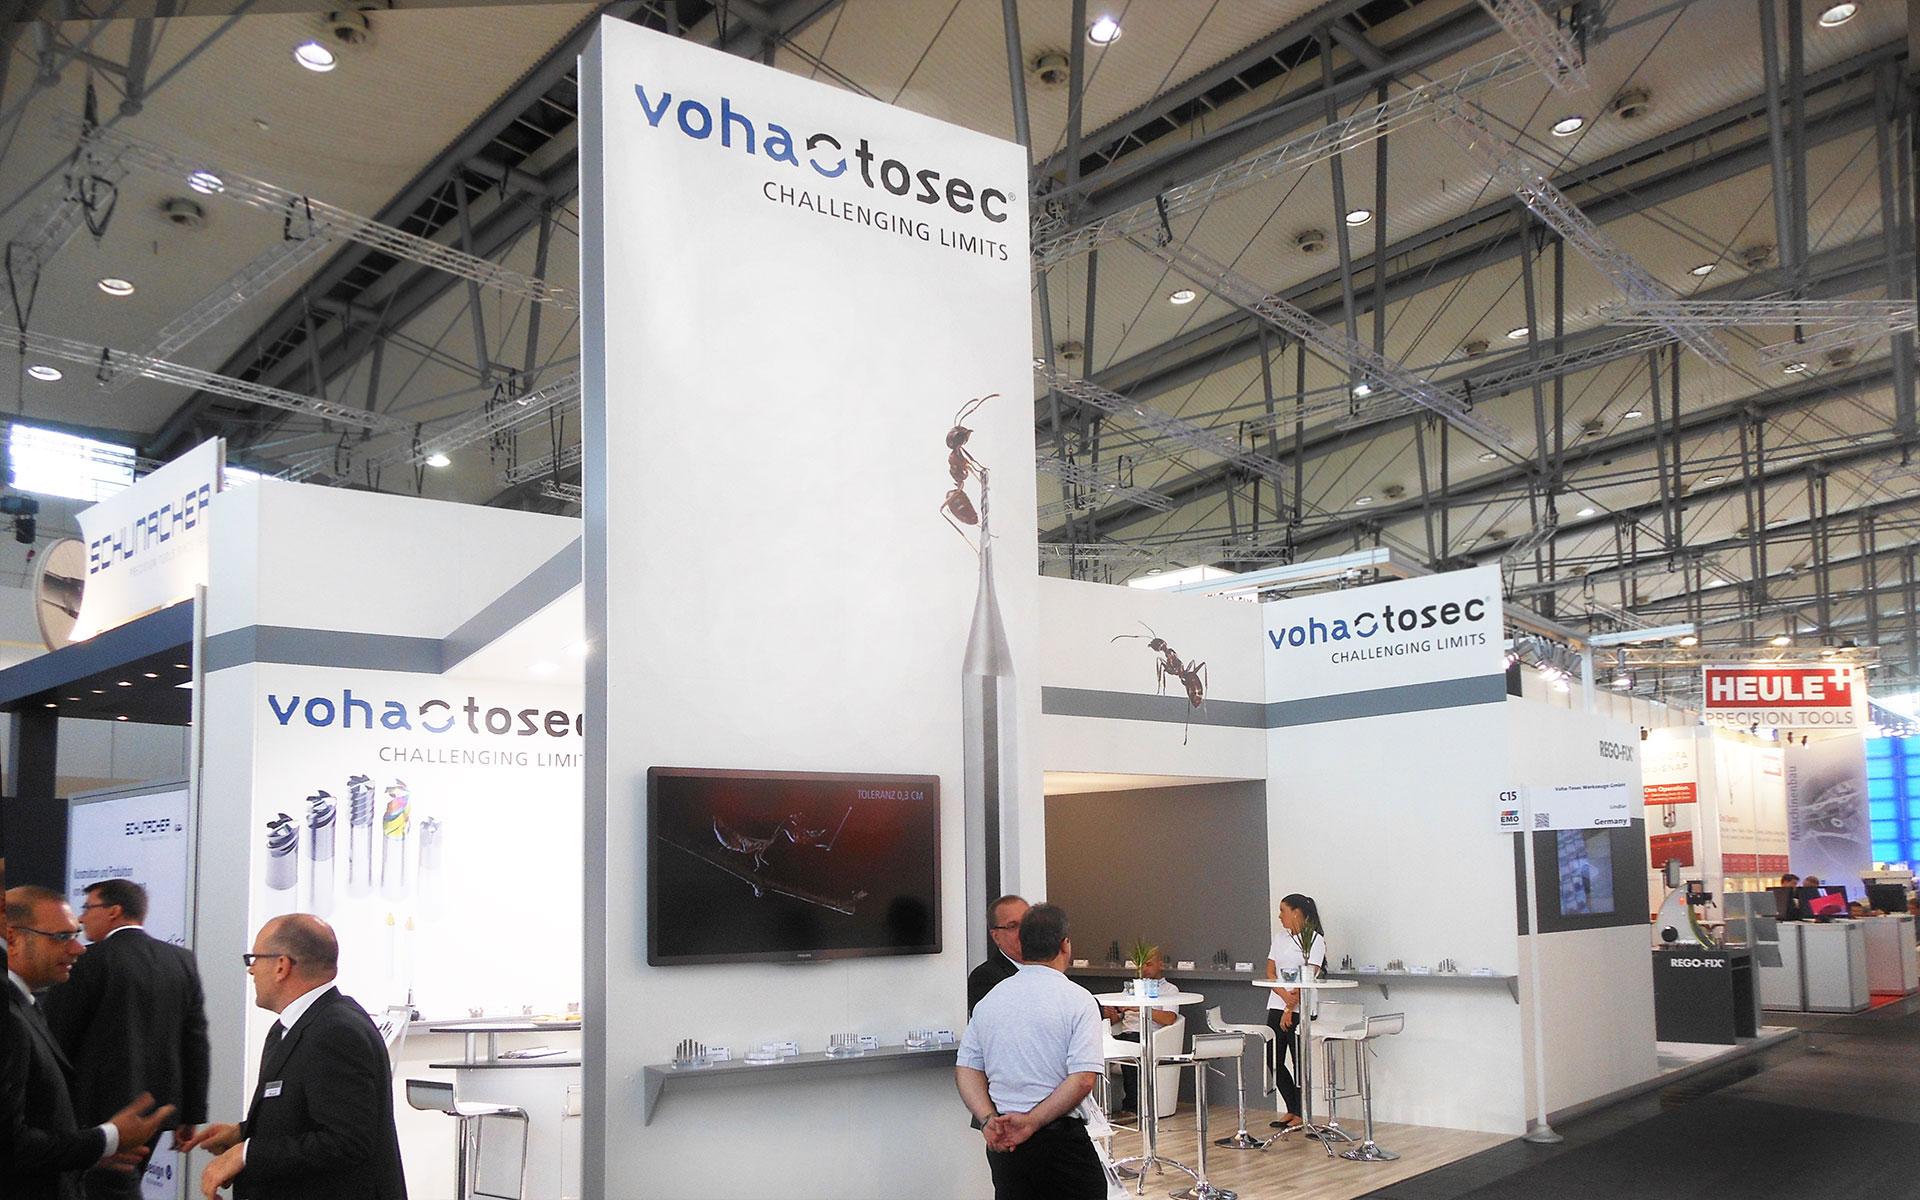 Vortosec_-DSCN0035